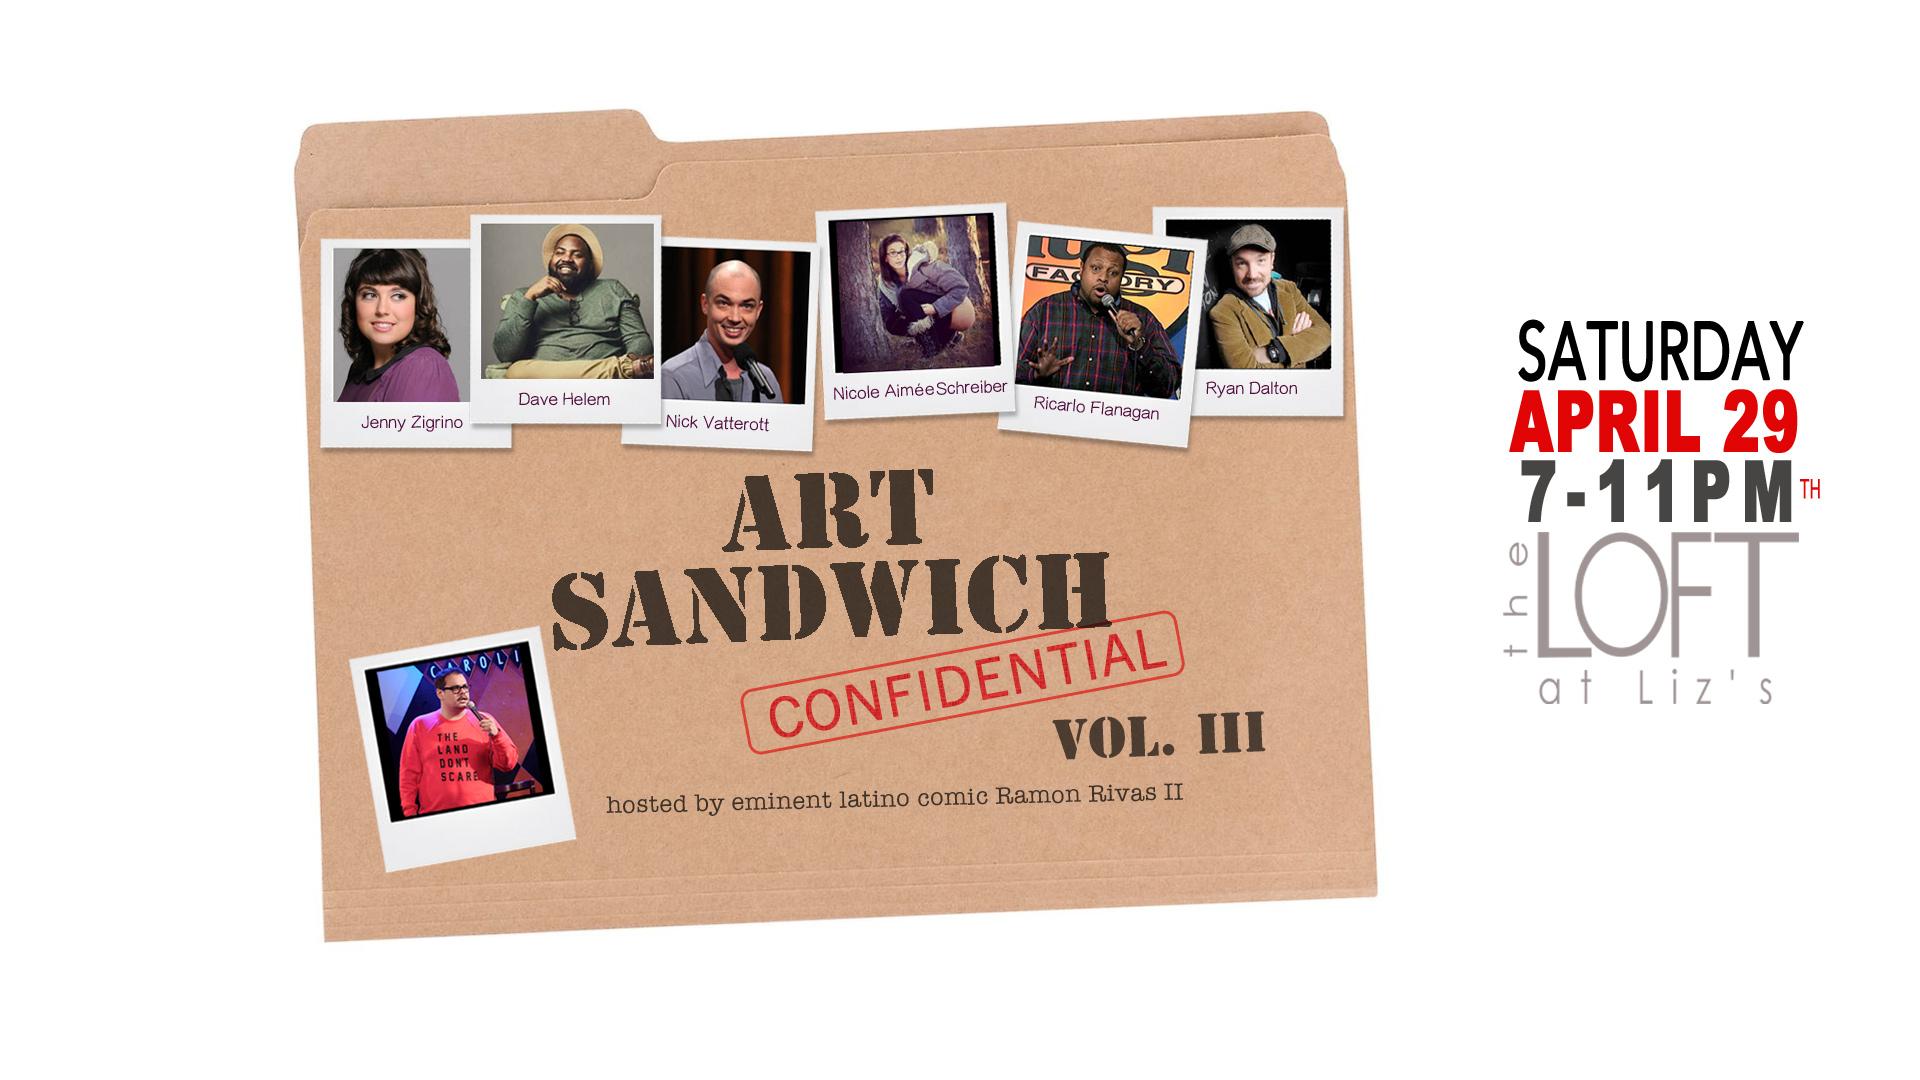 Art Sandwich Confidential vol III